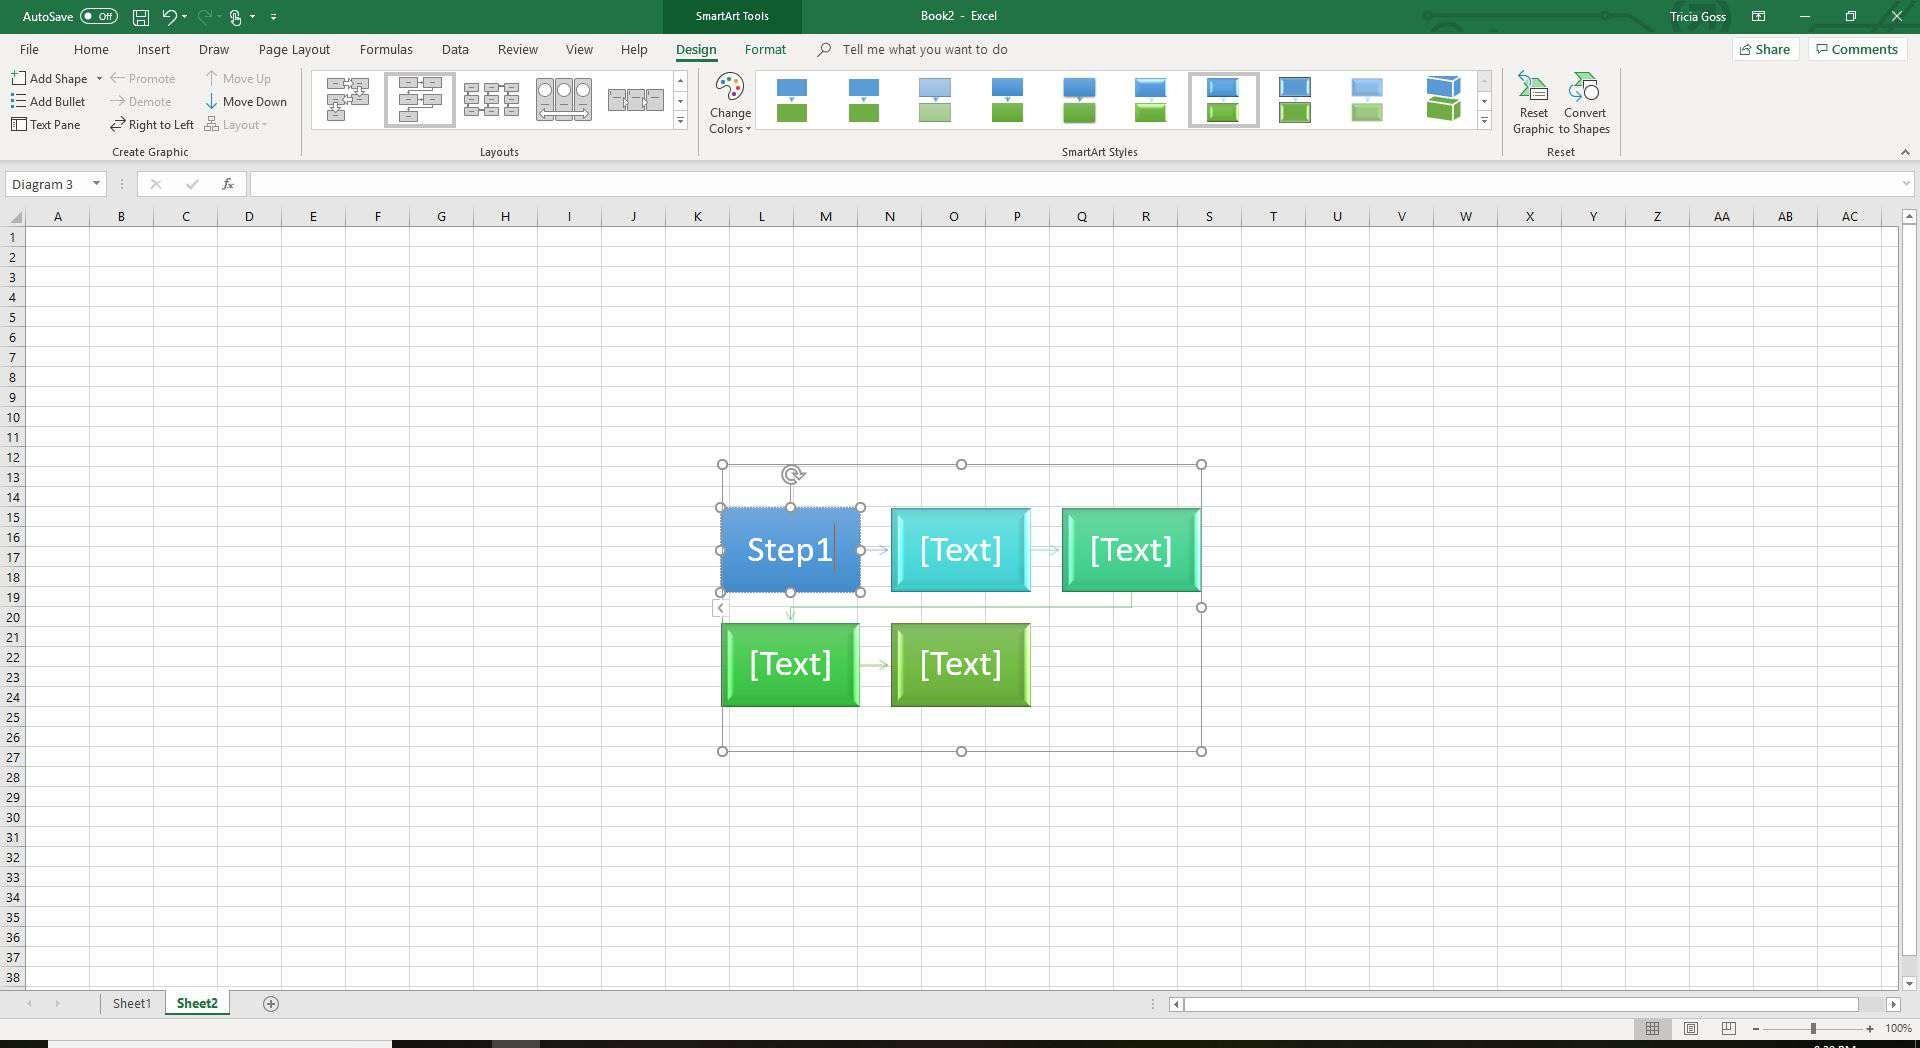 004 Top Flow Chart Microsoft Excel Highest Quality  Flowchart TemplateFull